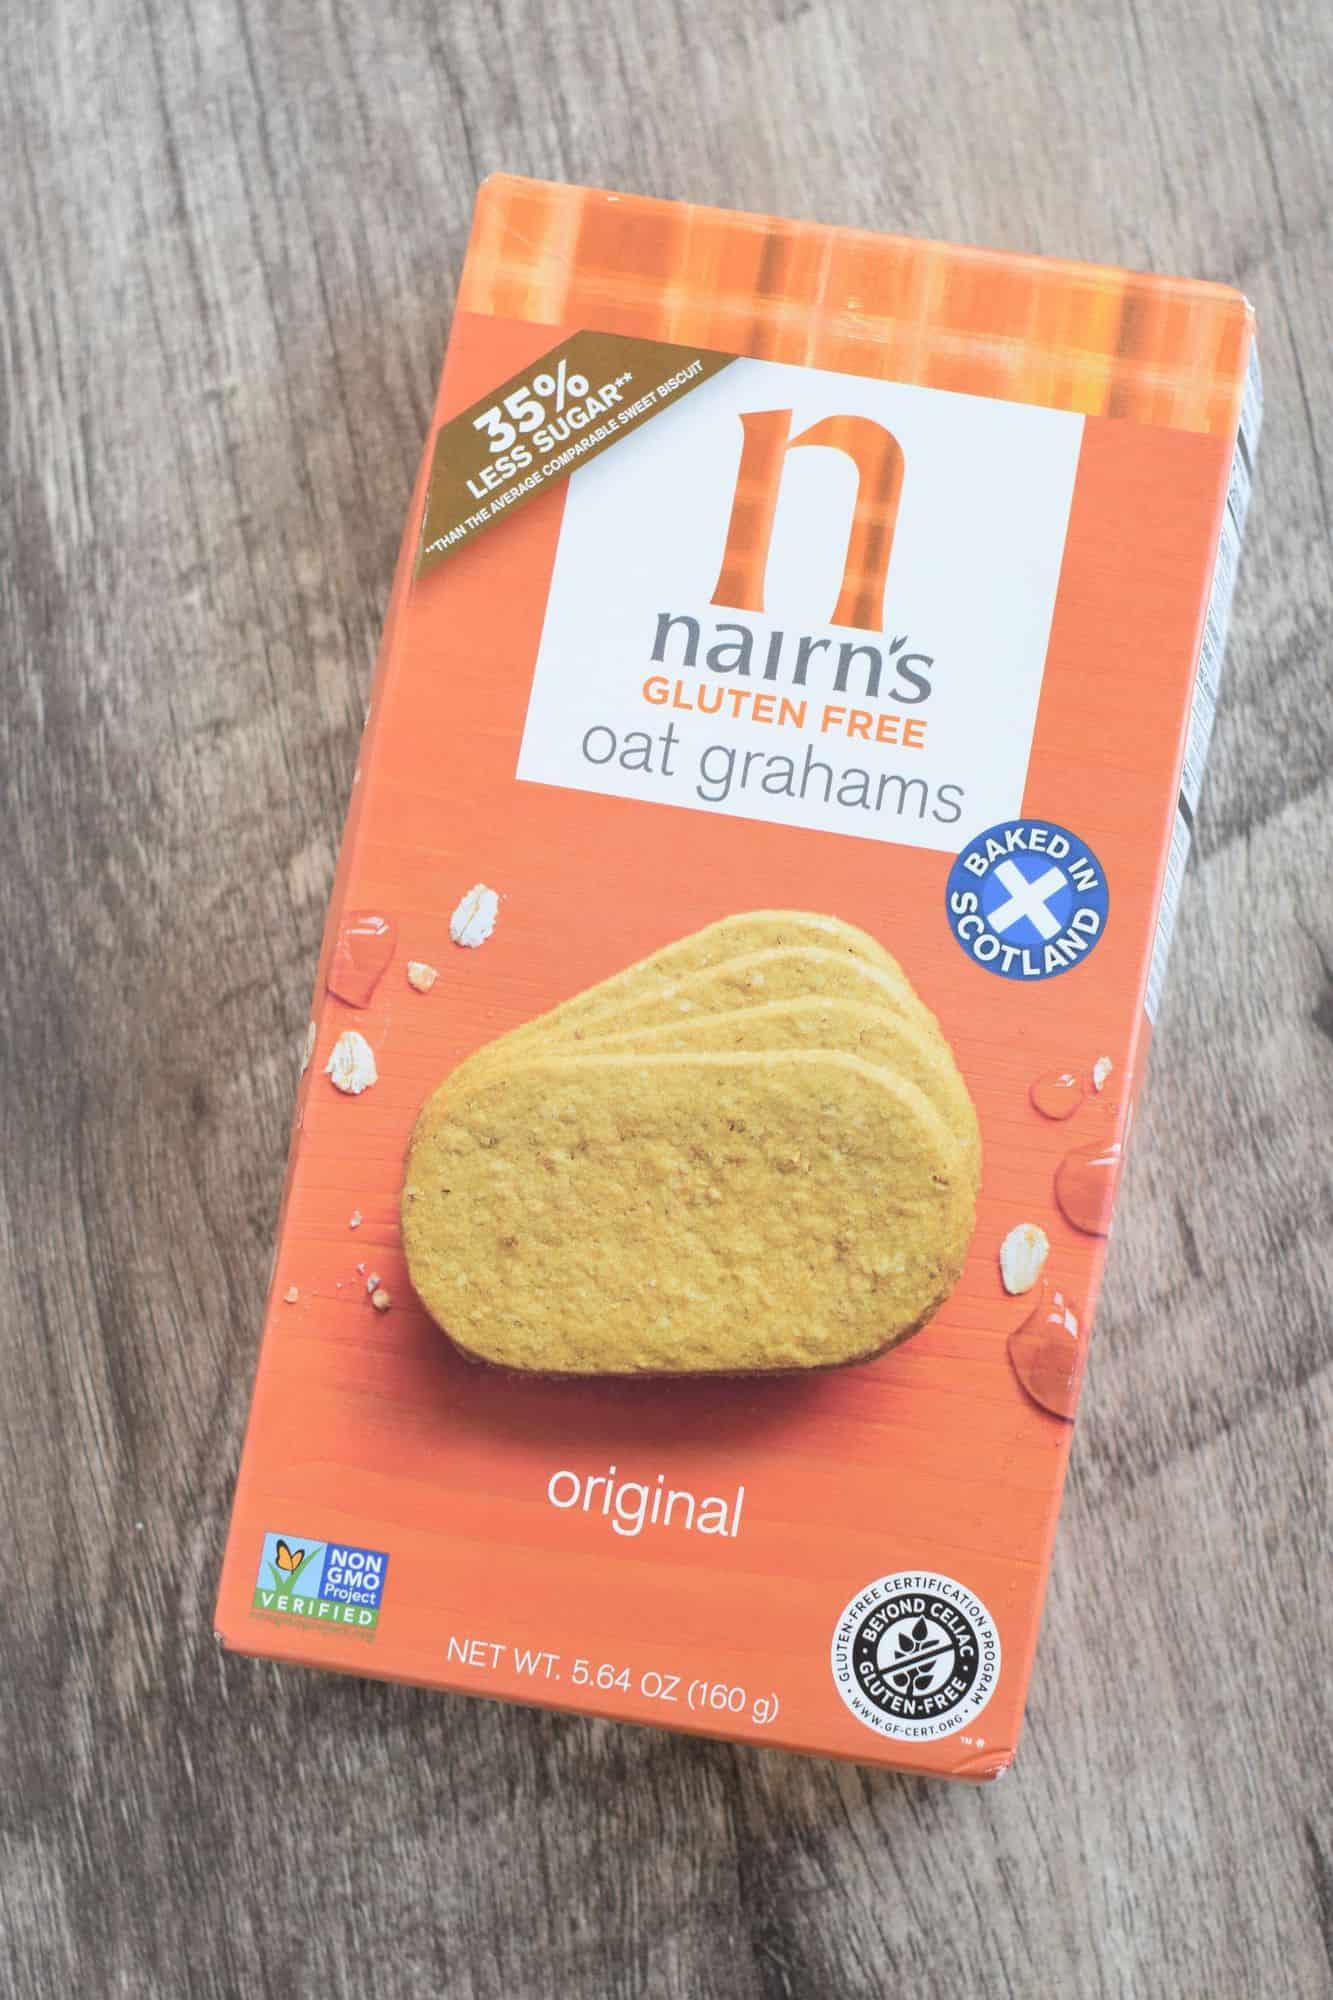 front of box of Nairn's gluten-free oat grahams